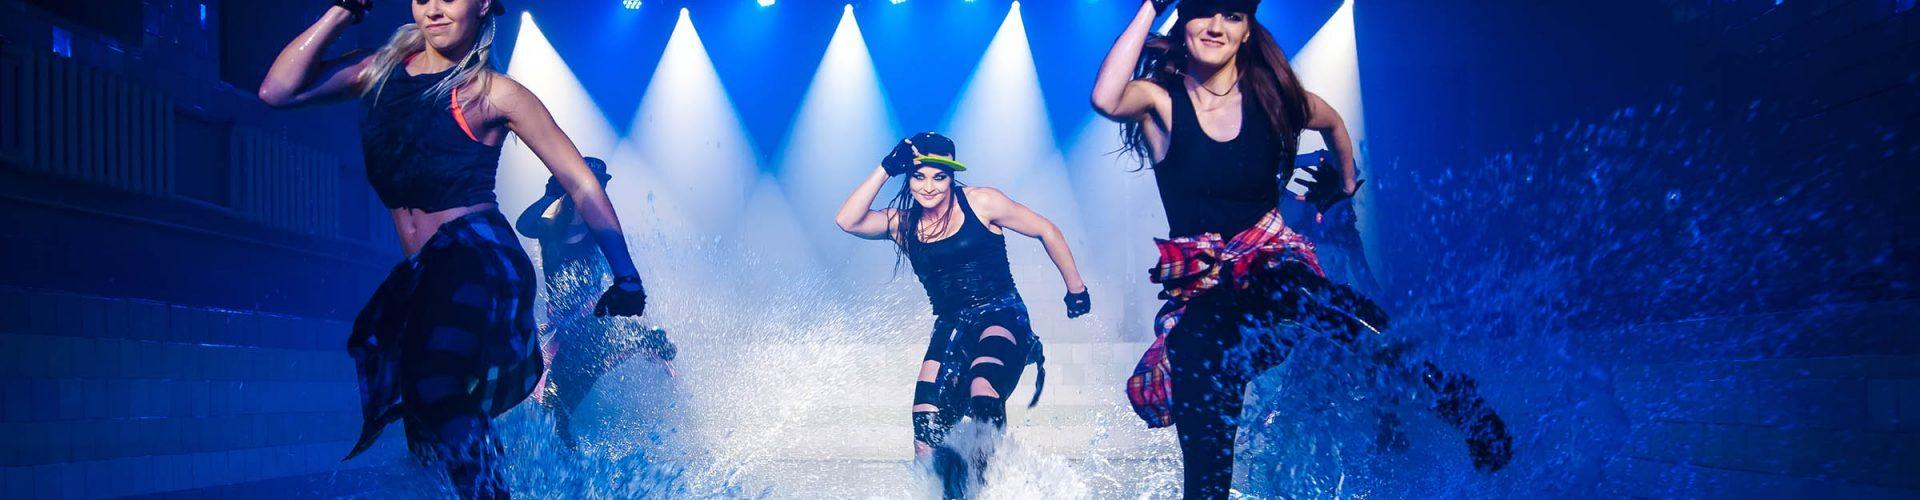 Dancers performing on stage dancing in water